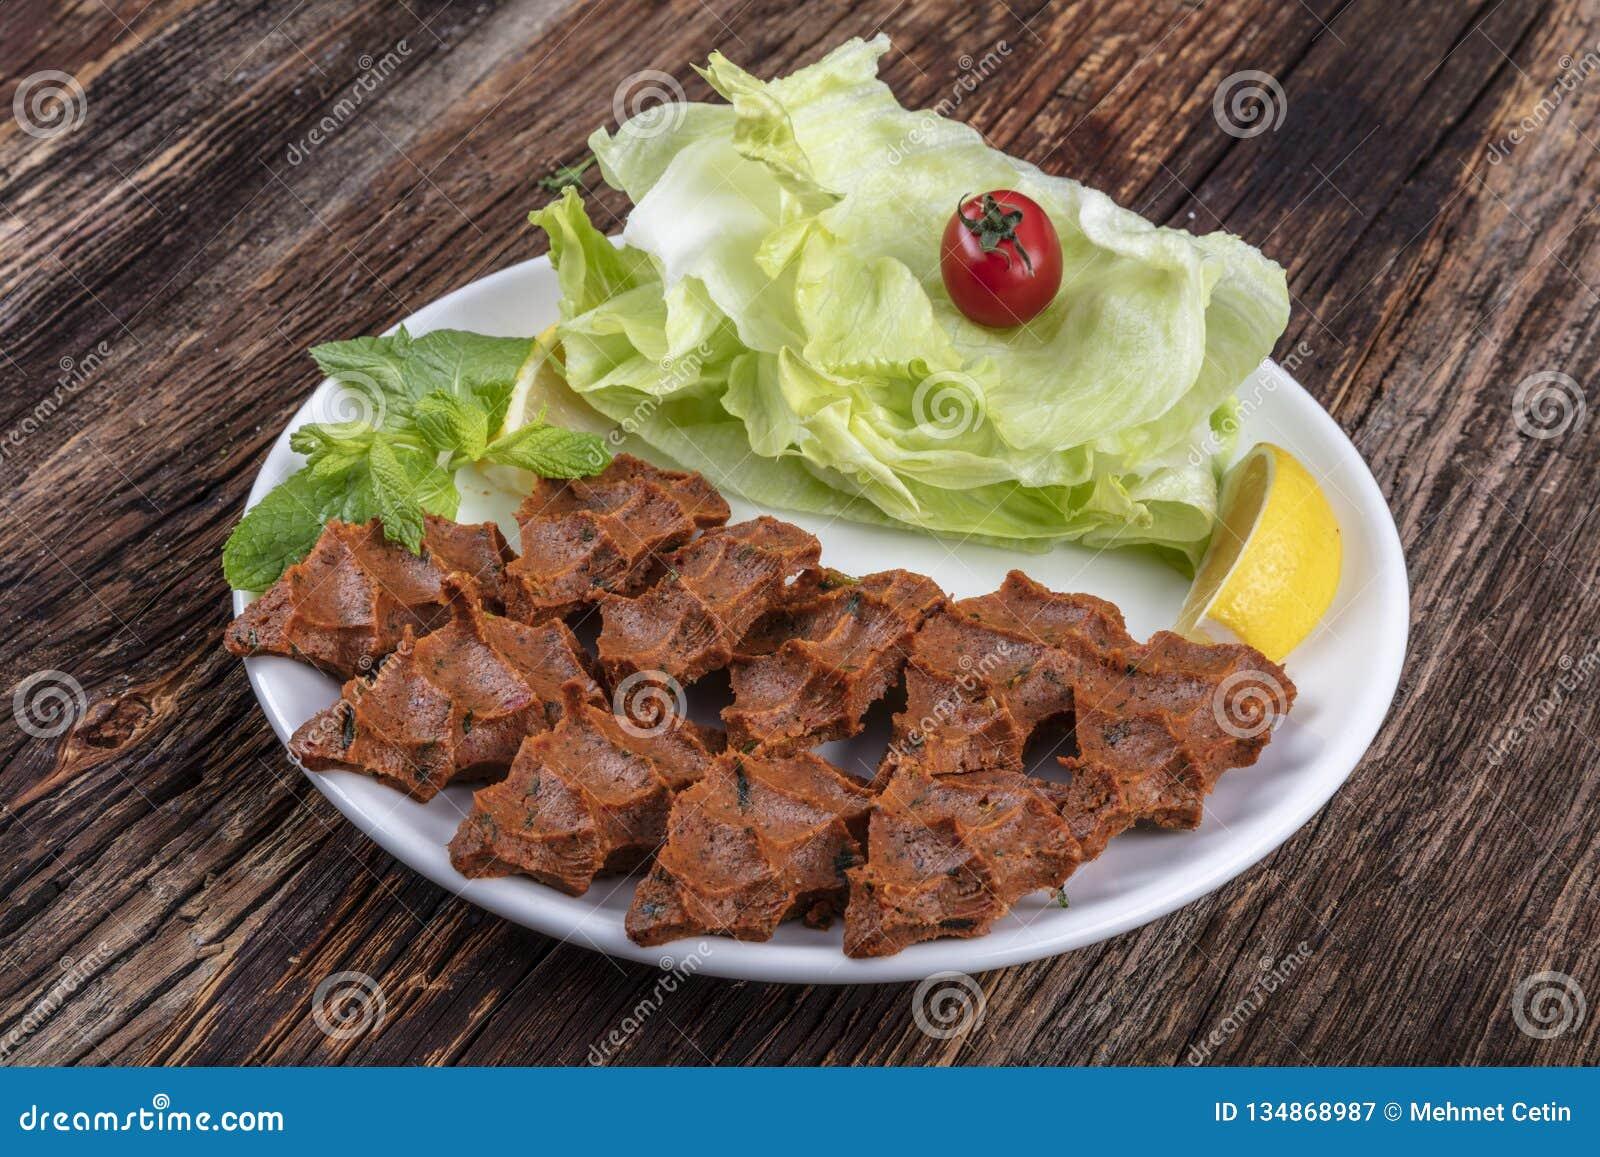 Kofte de clope, un plat de viande crue en cuisines turques et arméniennes E